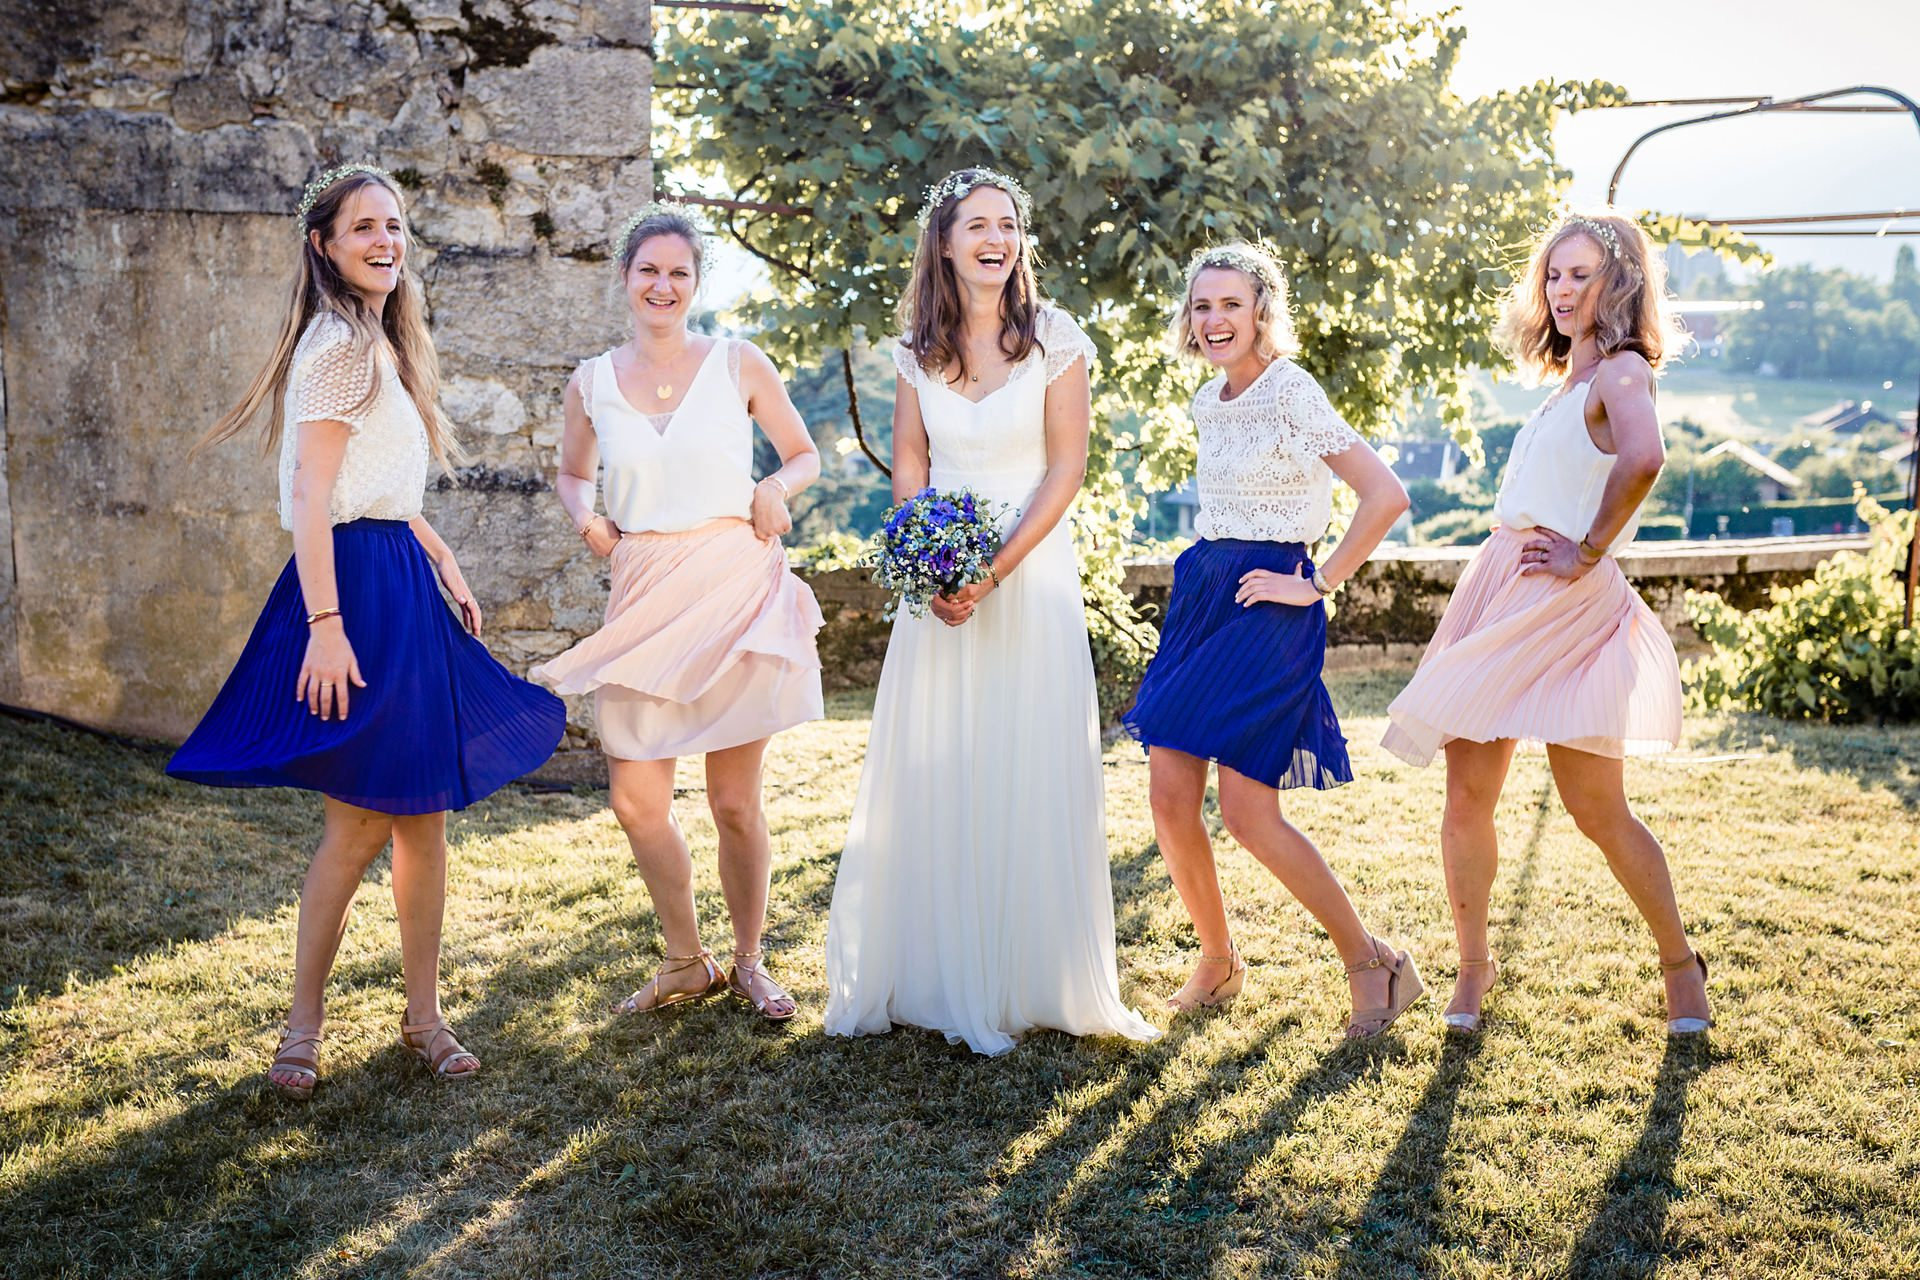 Photo de groupe fun - Matthieu Chandelier photographe de mariage